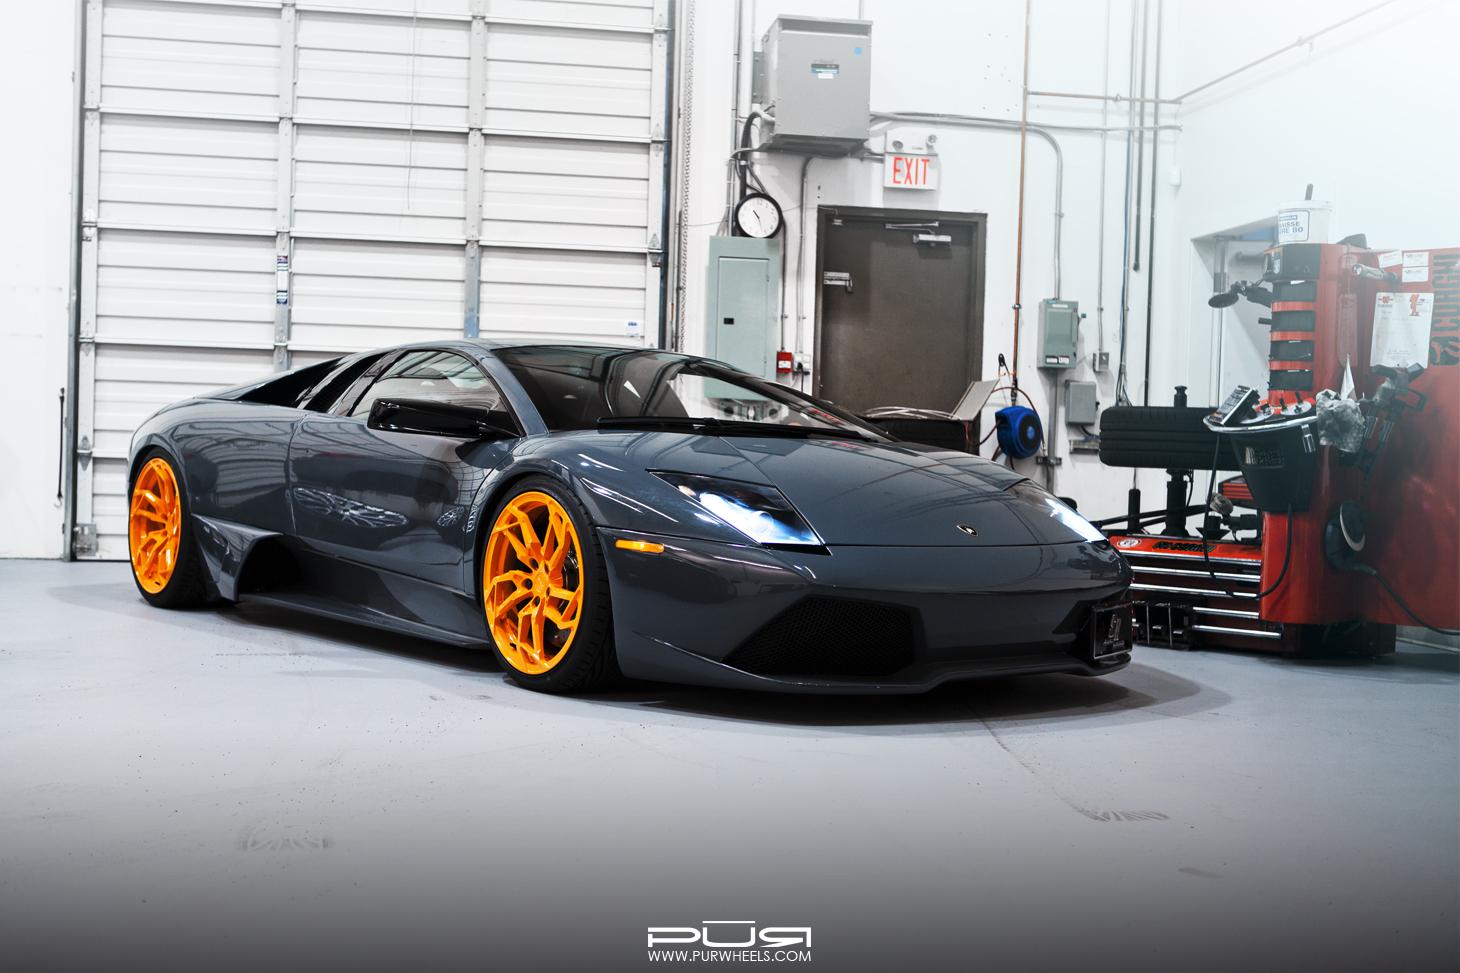 Stunning Lamborghini Murcielago LP640 on Orange PUR Wheels - GTspirit